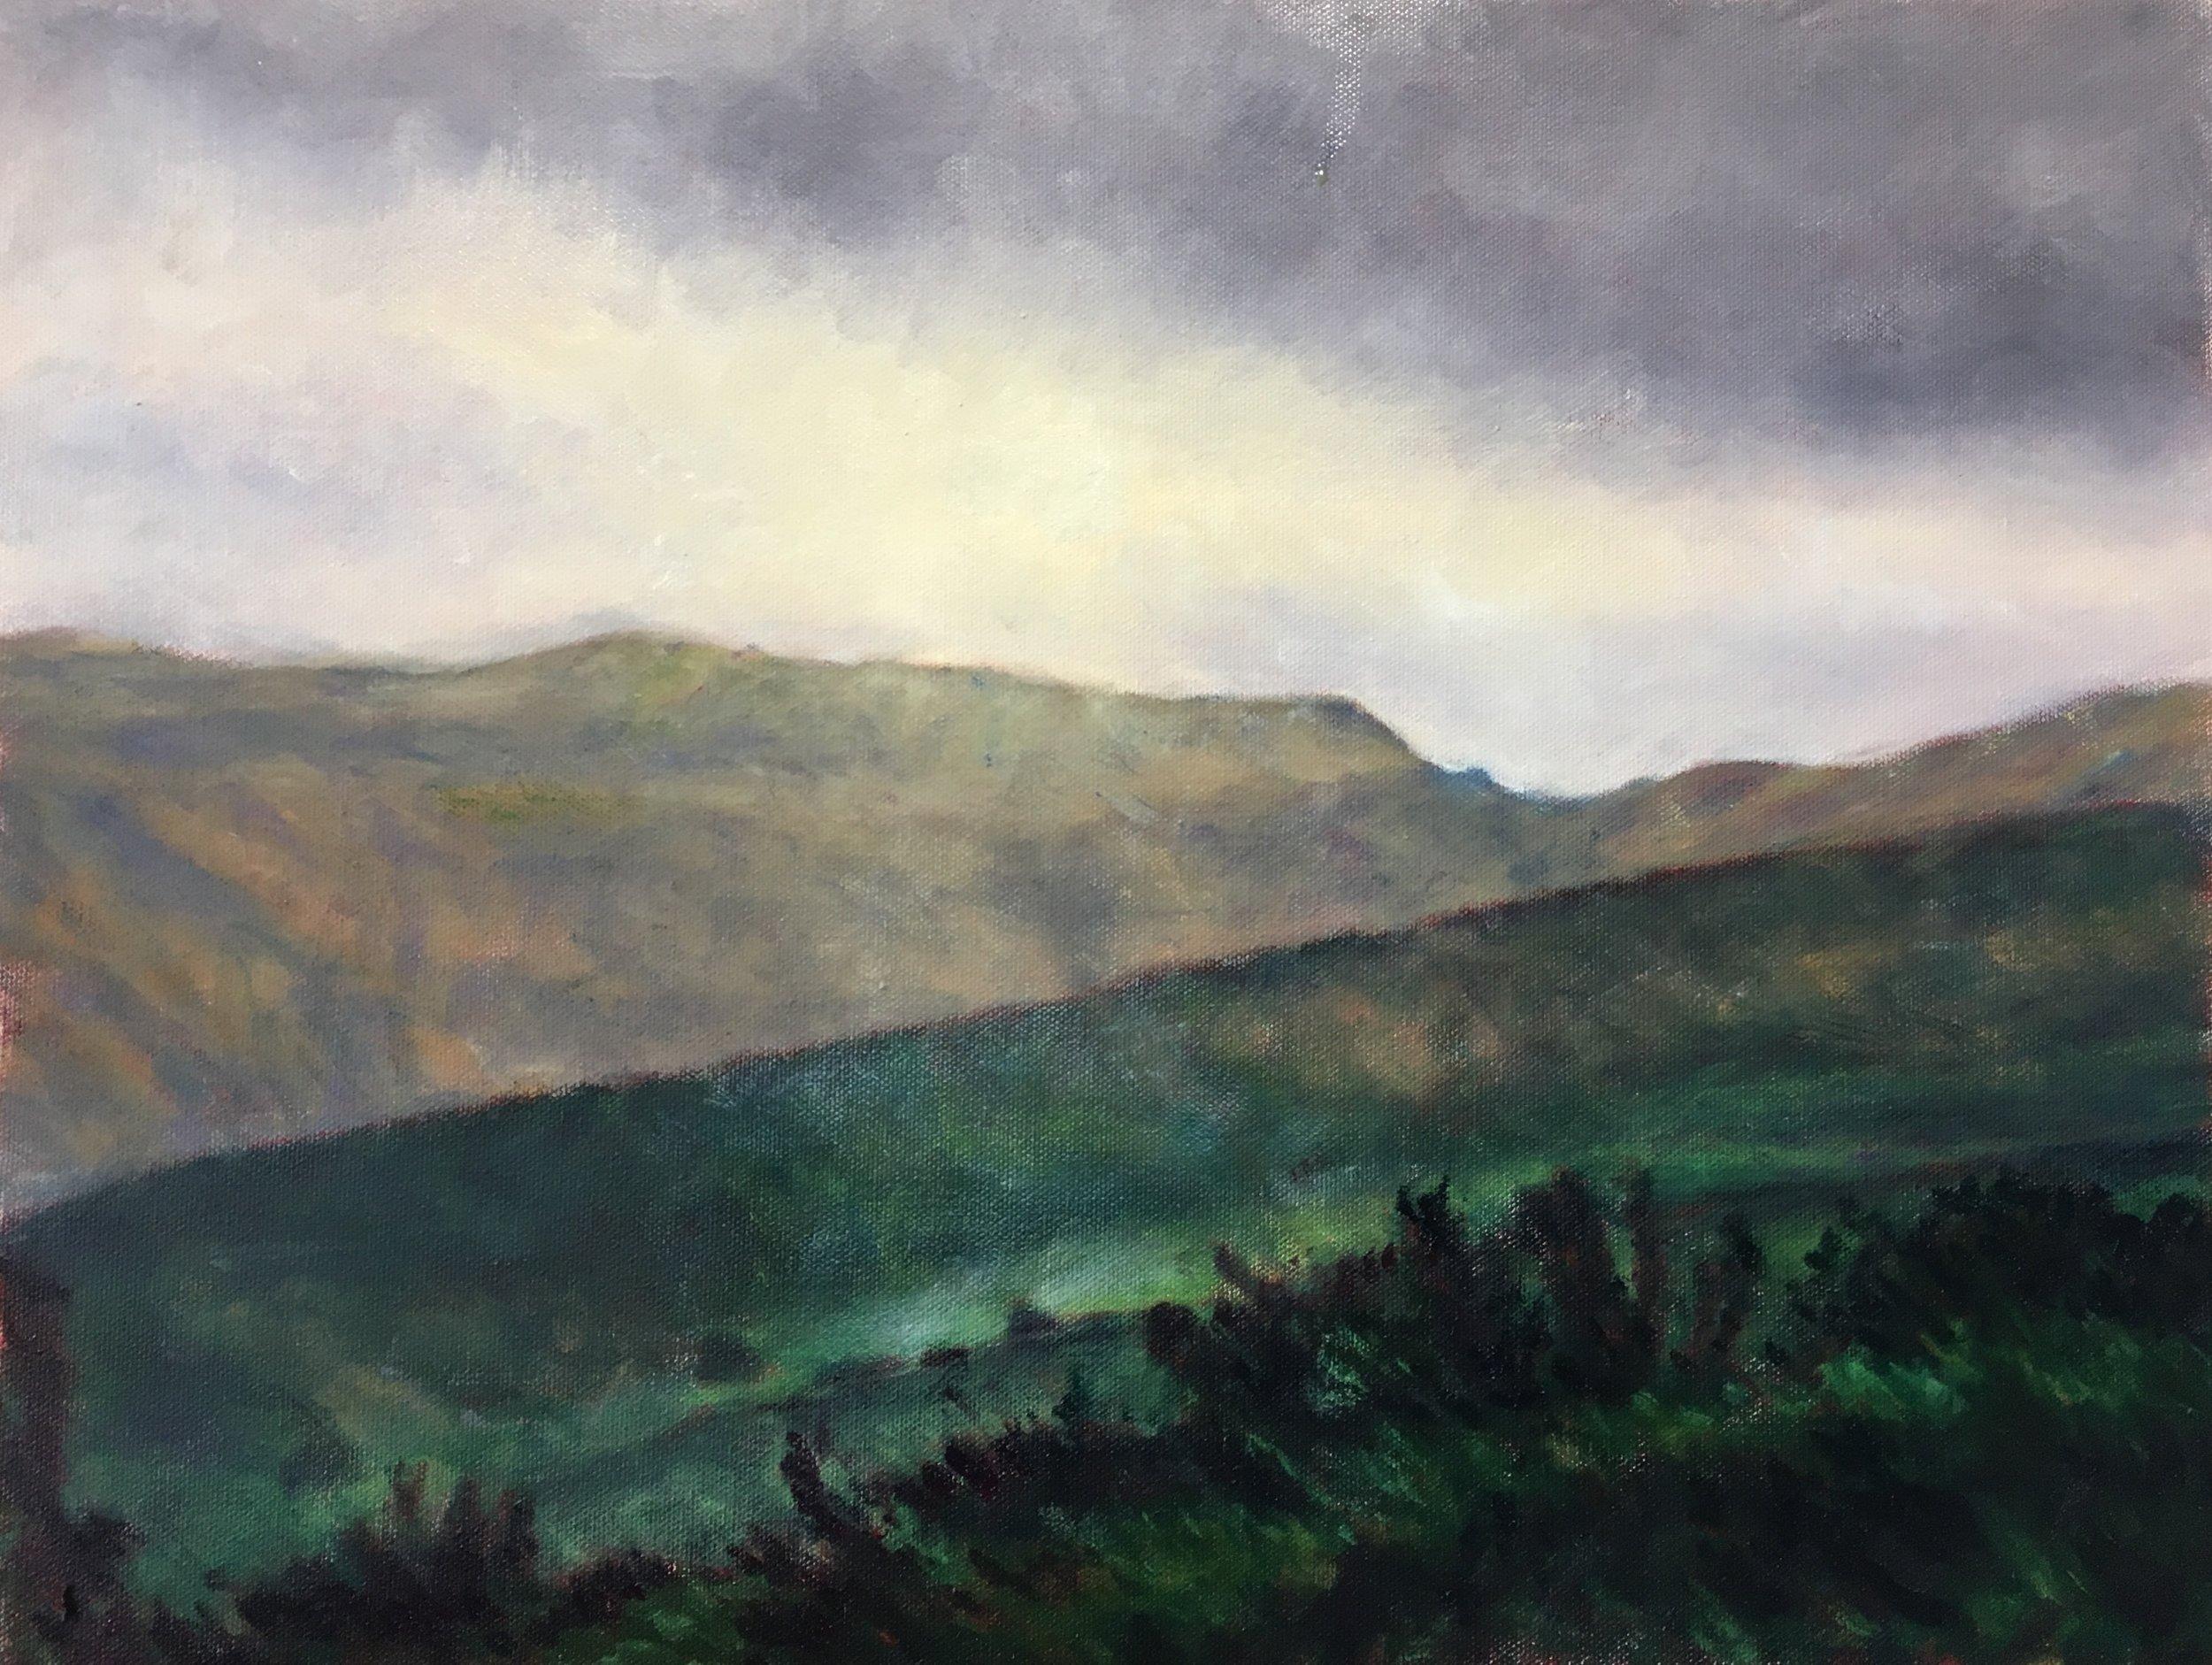 Morning (2) from Calton Hill, Edinburgh